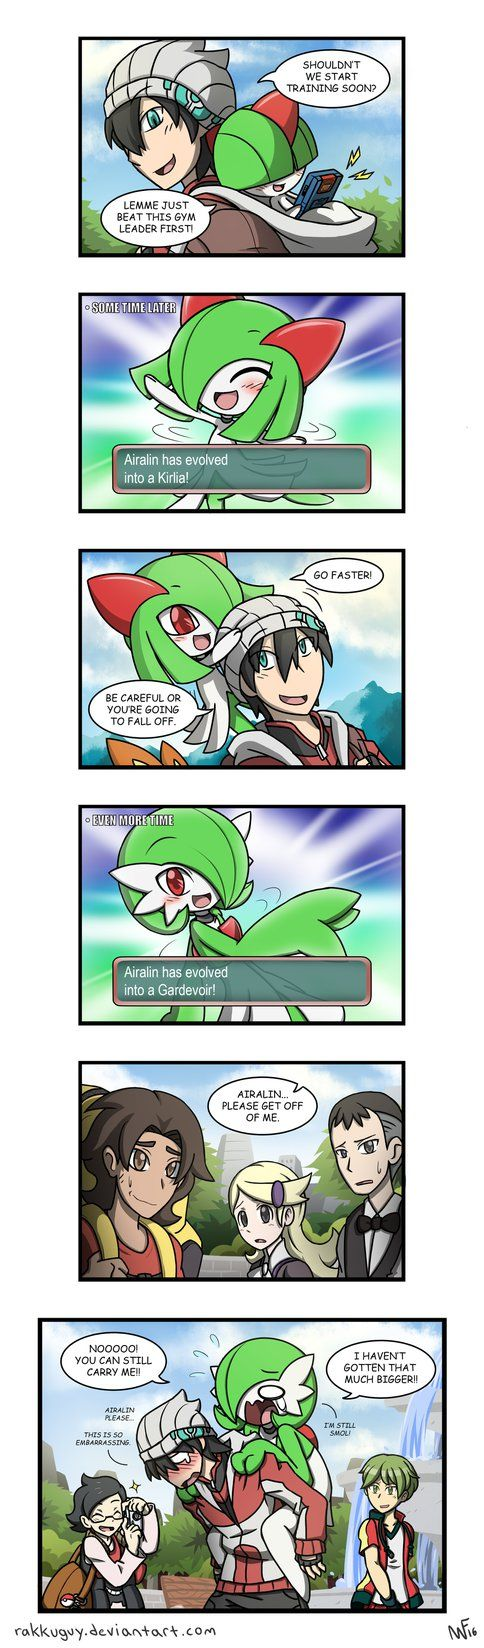 best pokémon images on pinterest funny stuff pokemon stuff and